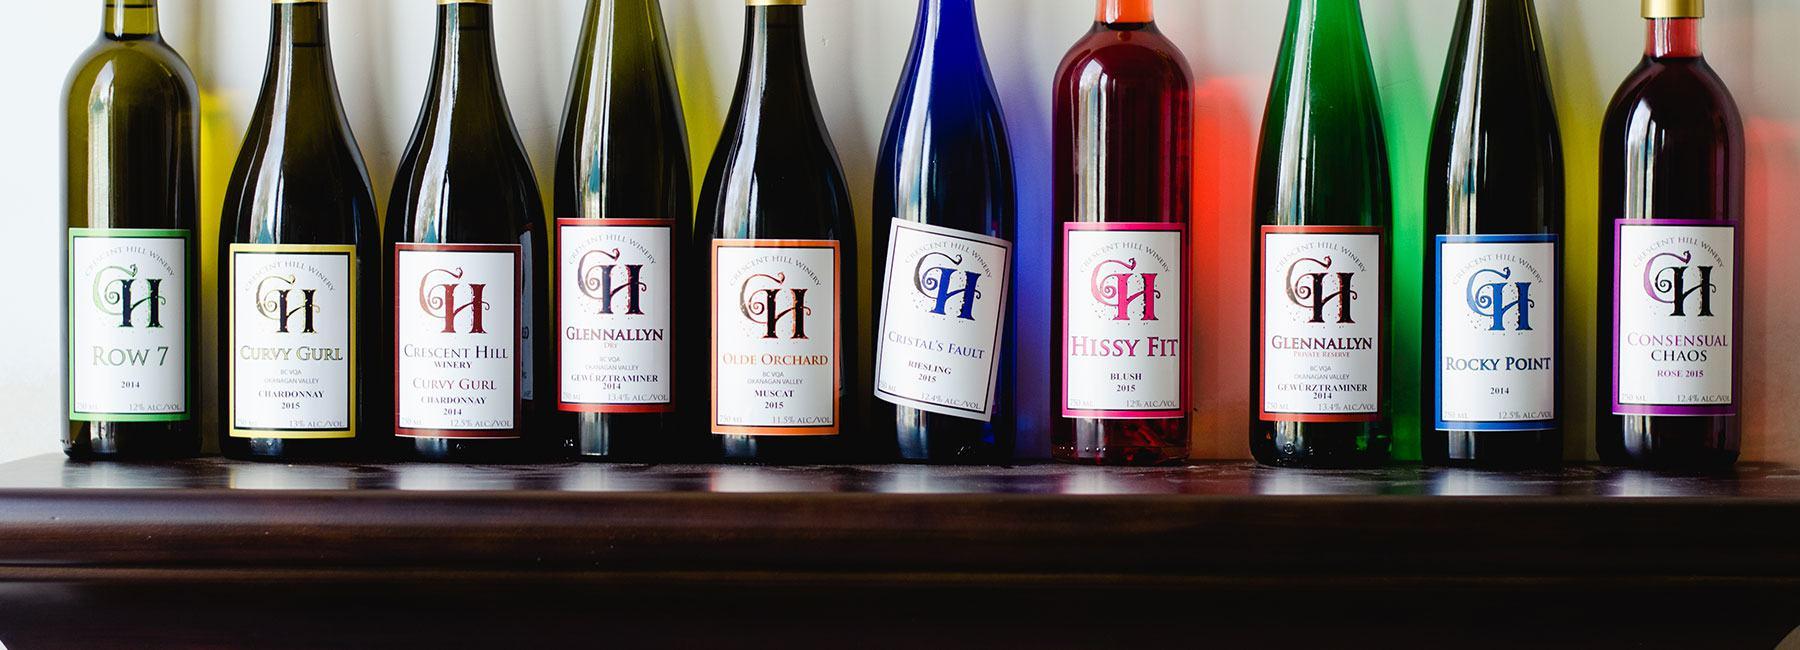 Crescent Hill Winery, Penticton BC